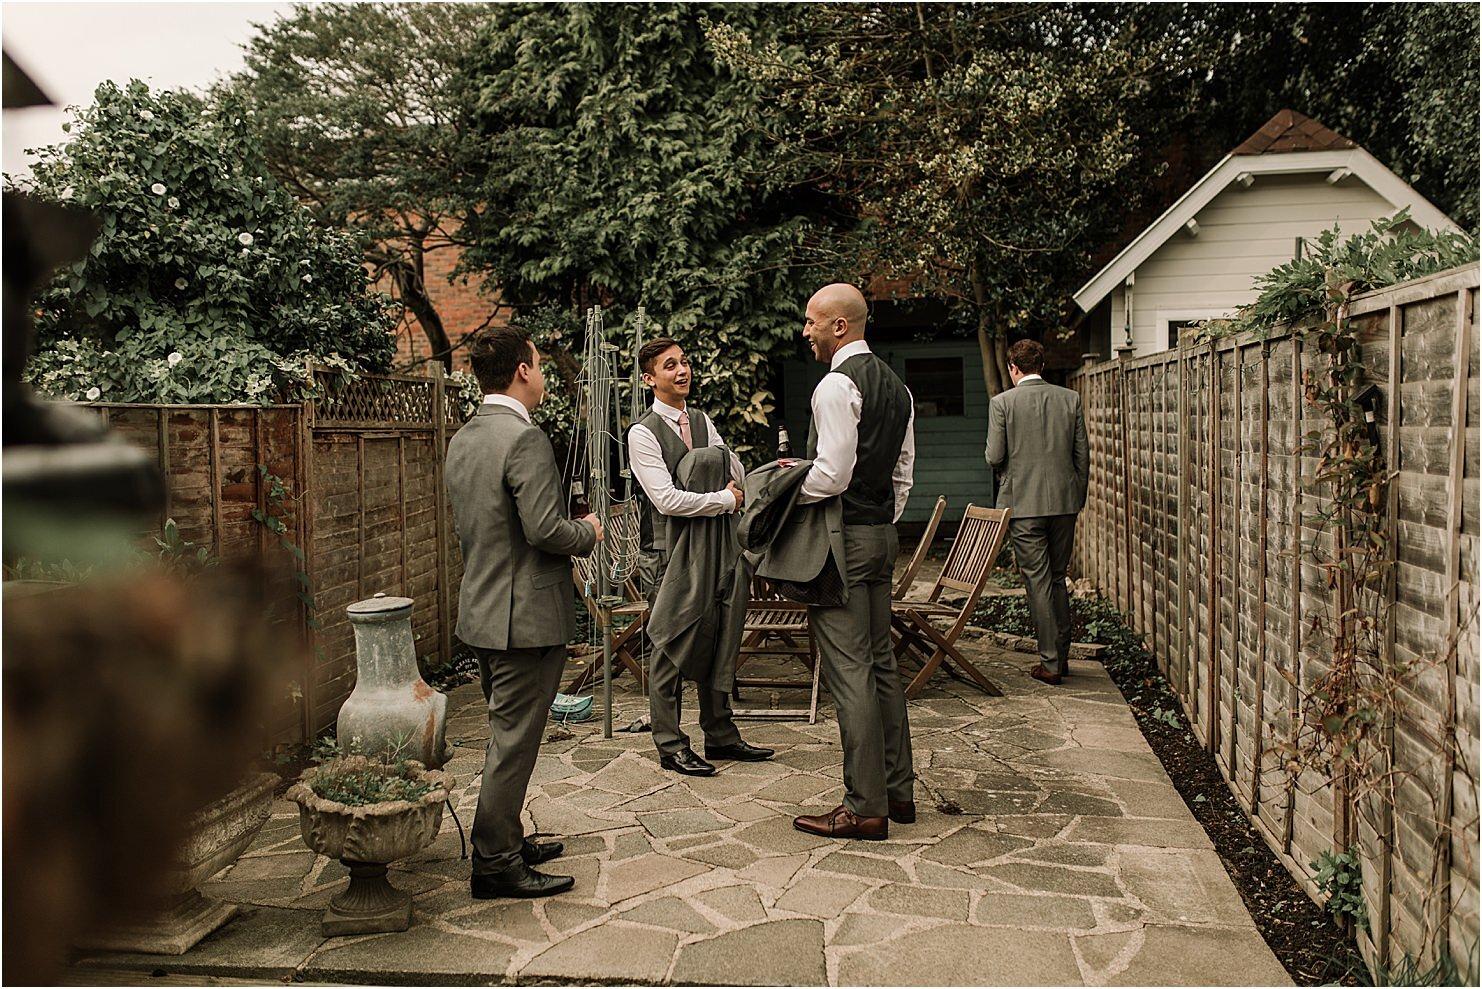 boda-de-cuento-en-castillo-boda-en-londres-13.jpg